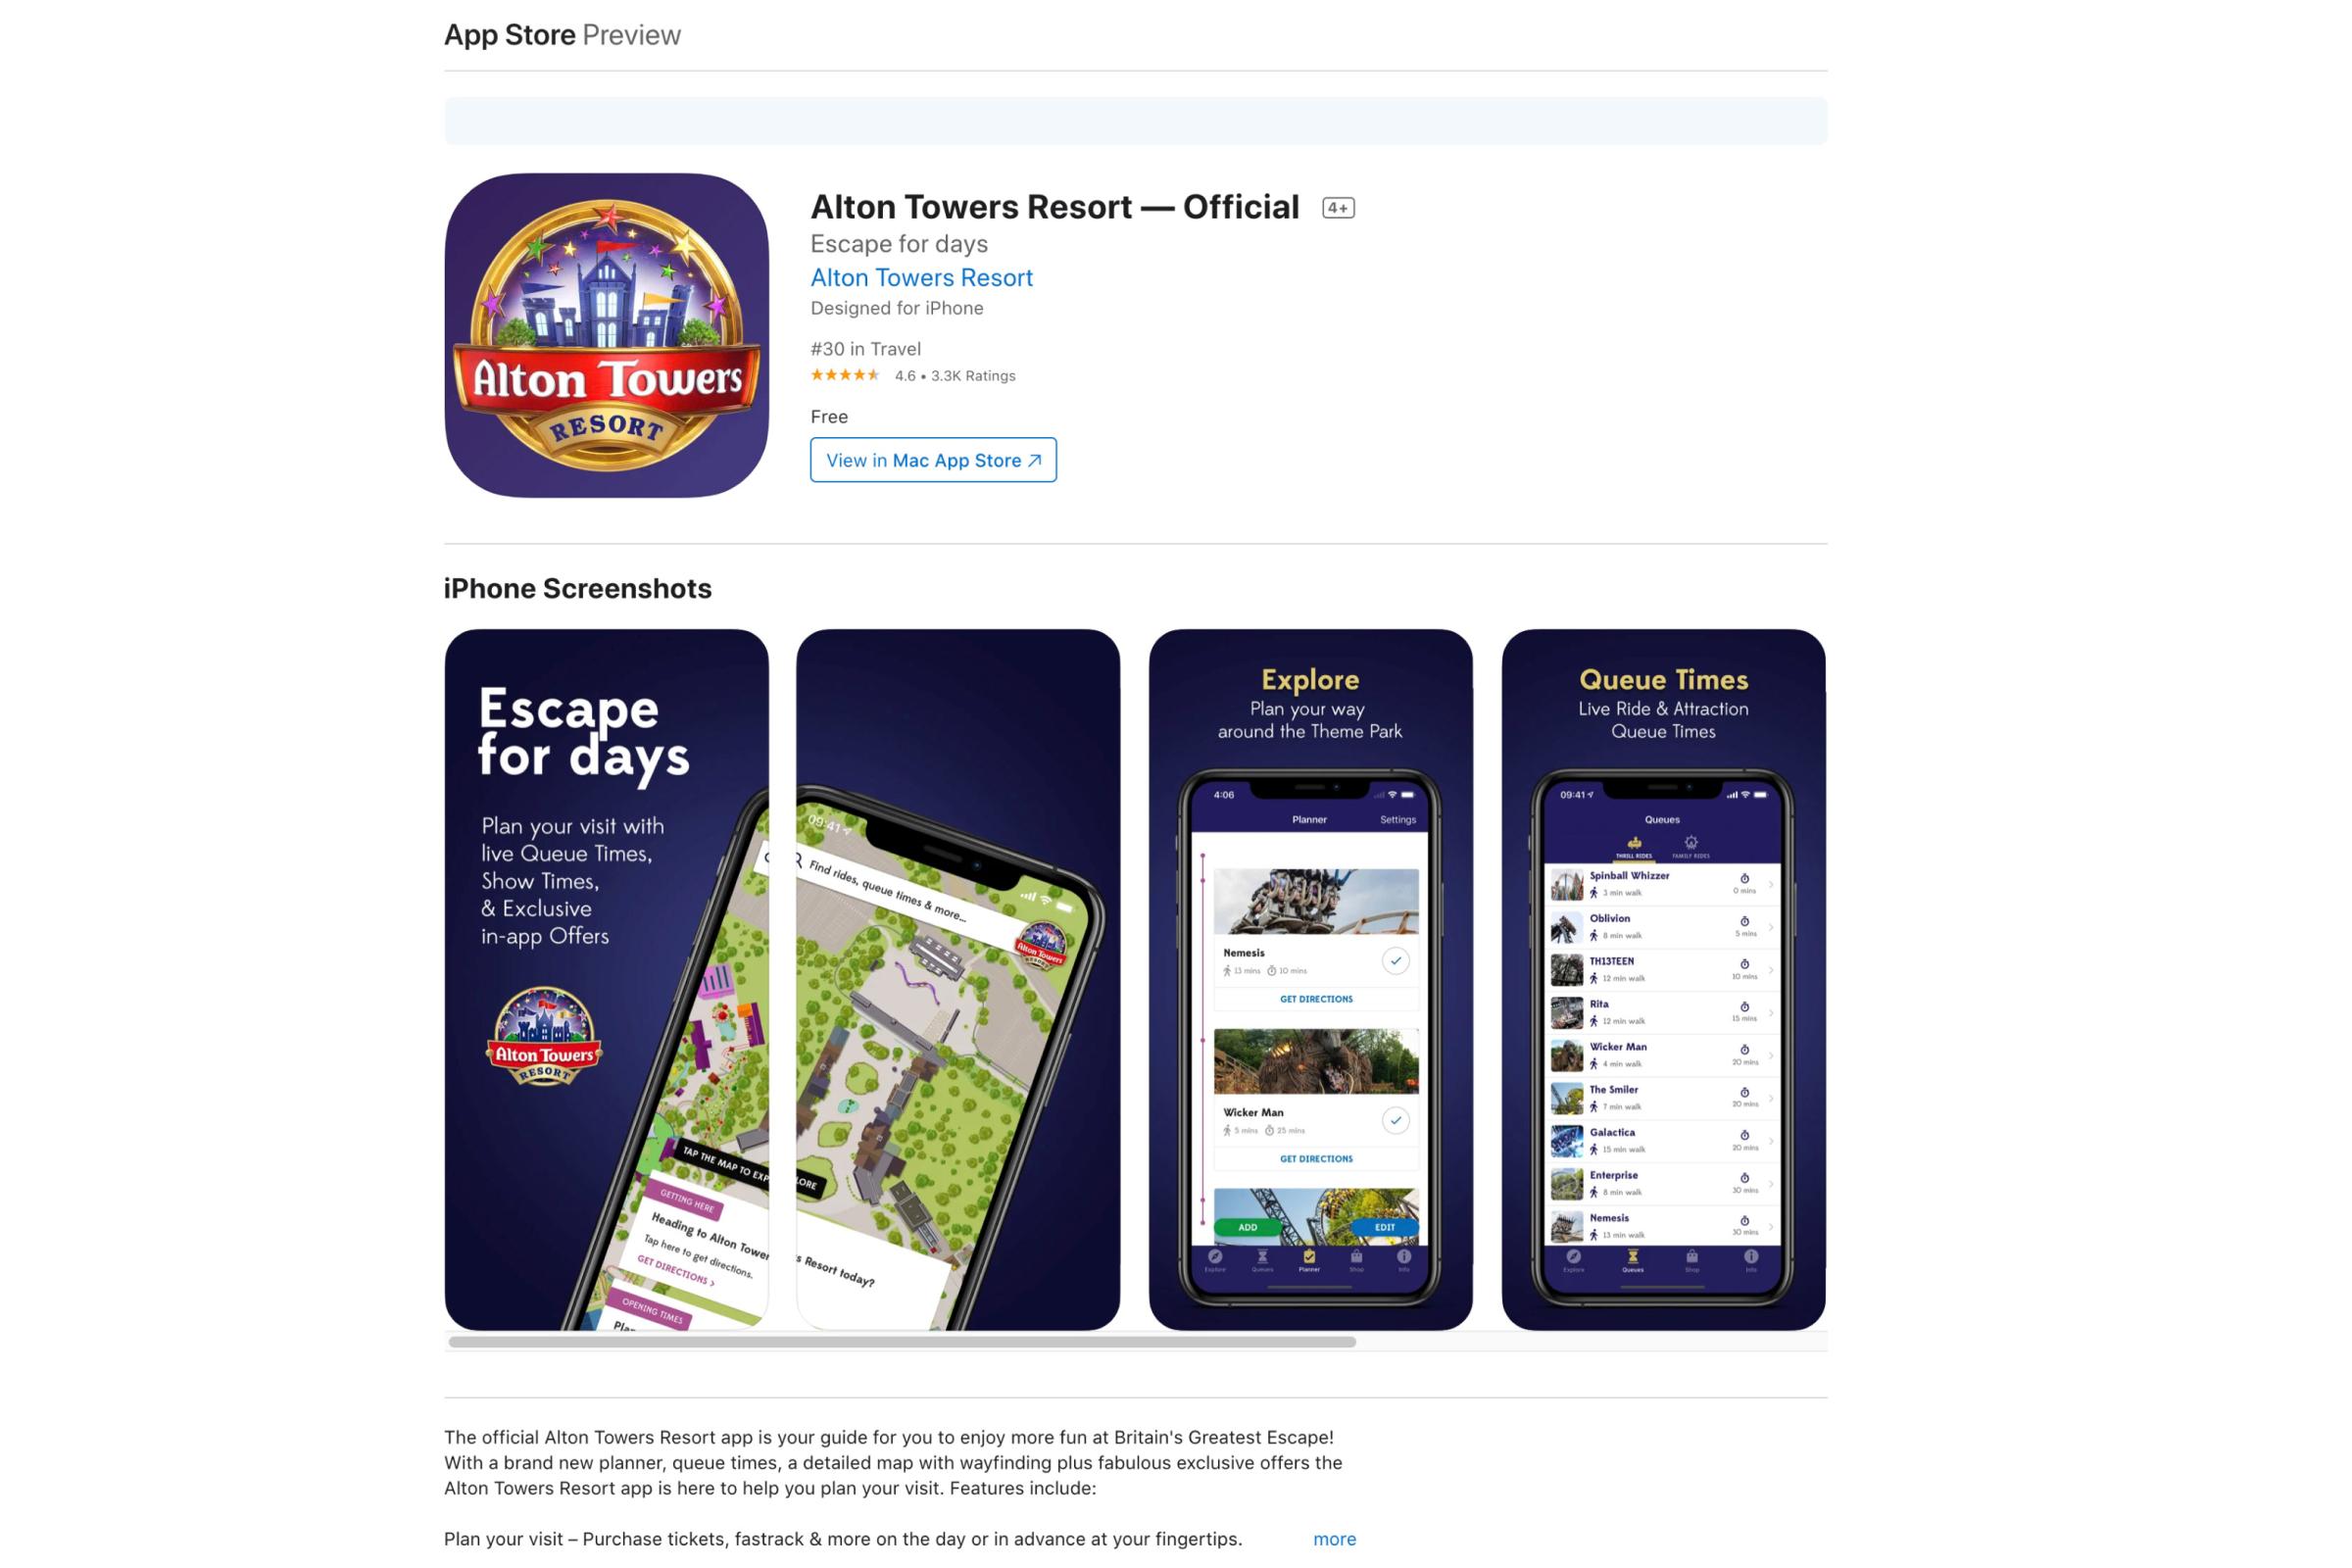 Alton Towers Resort app in the Apple app store